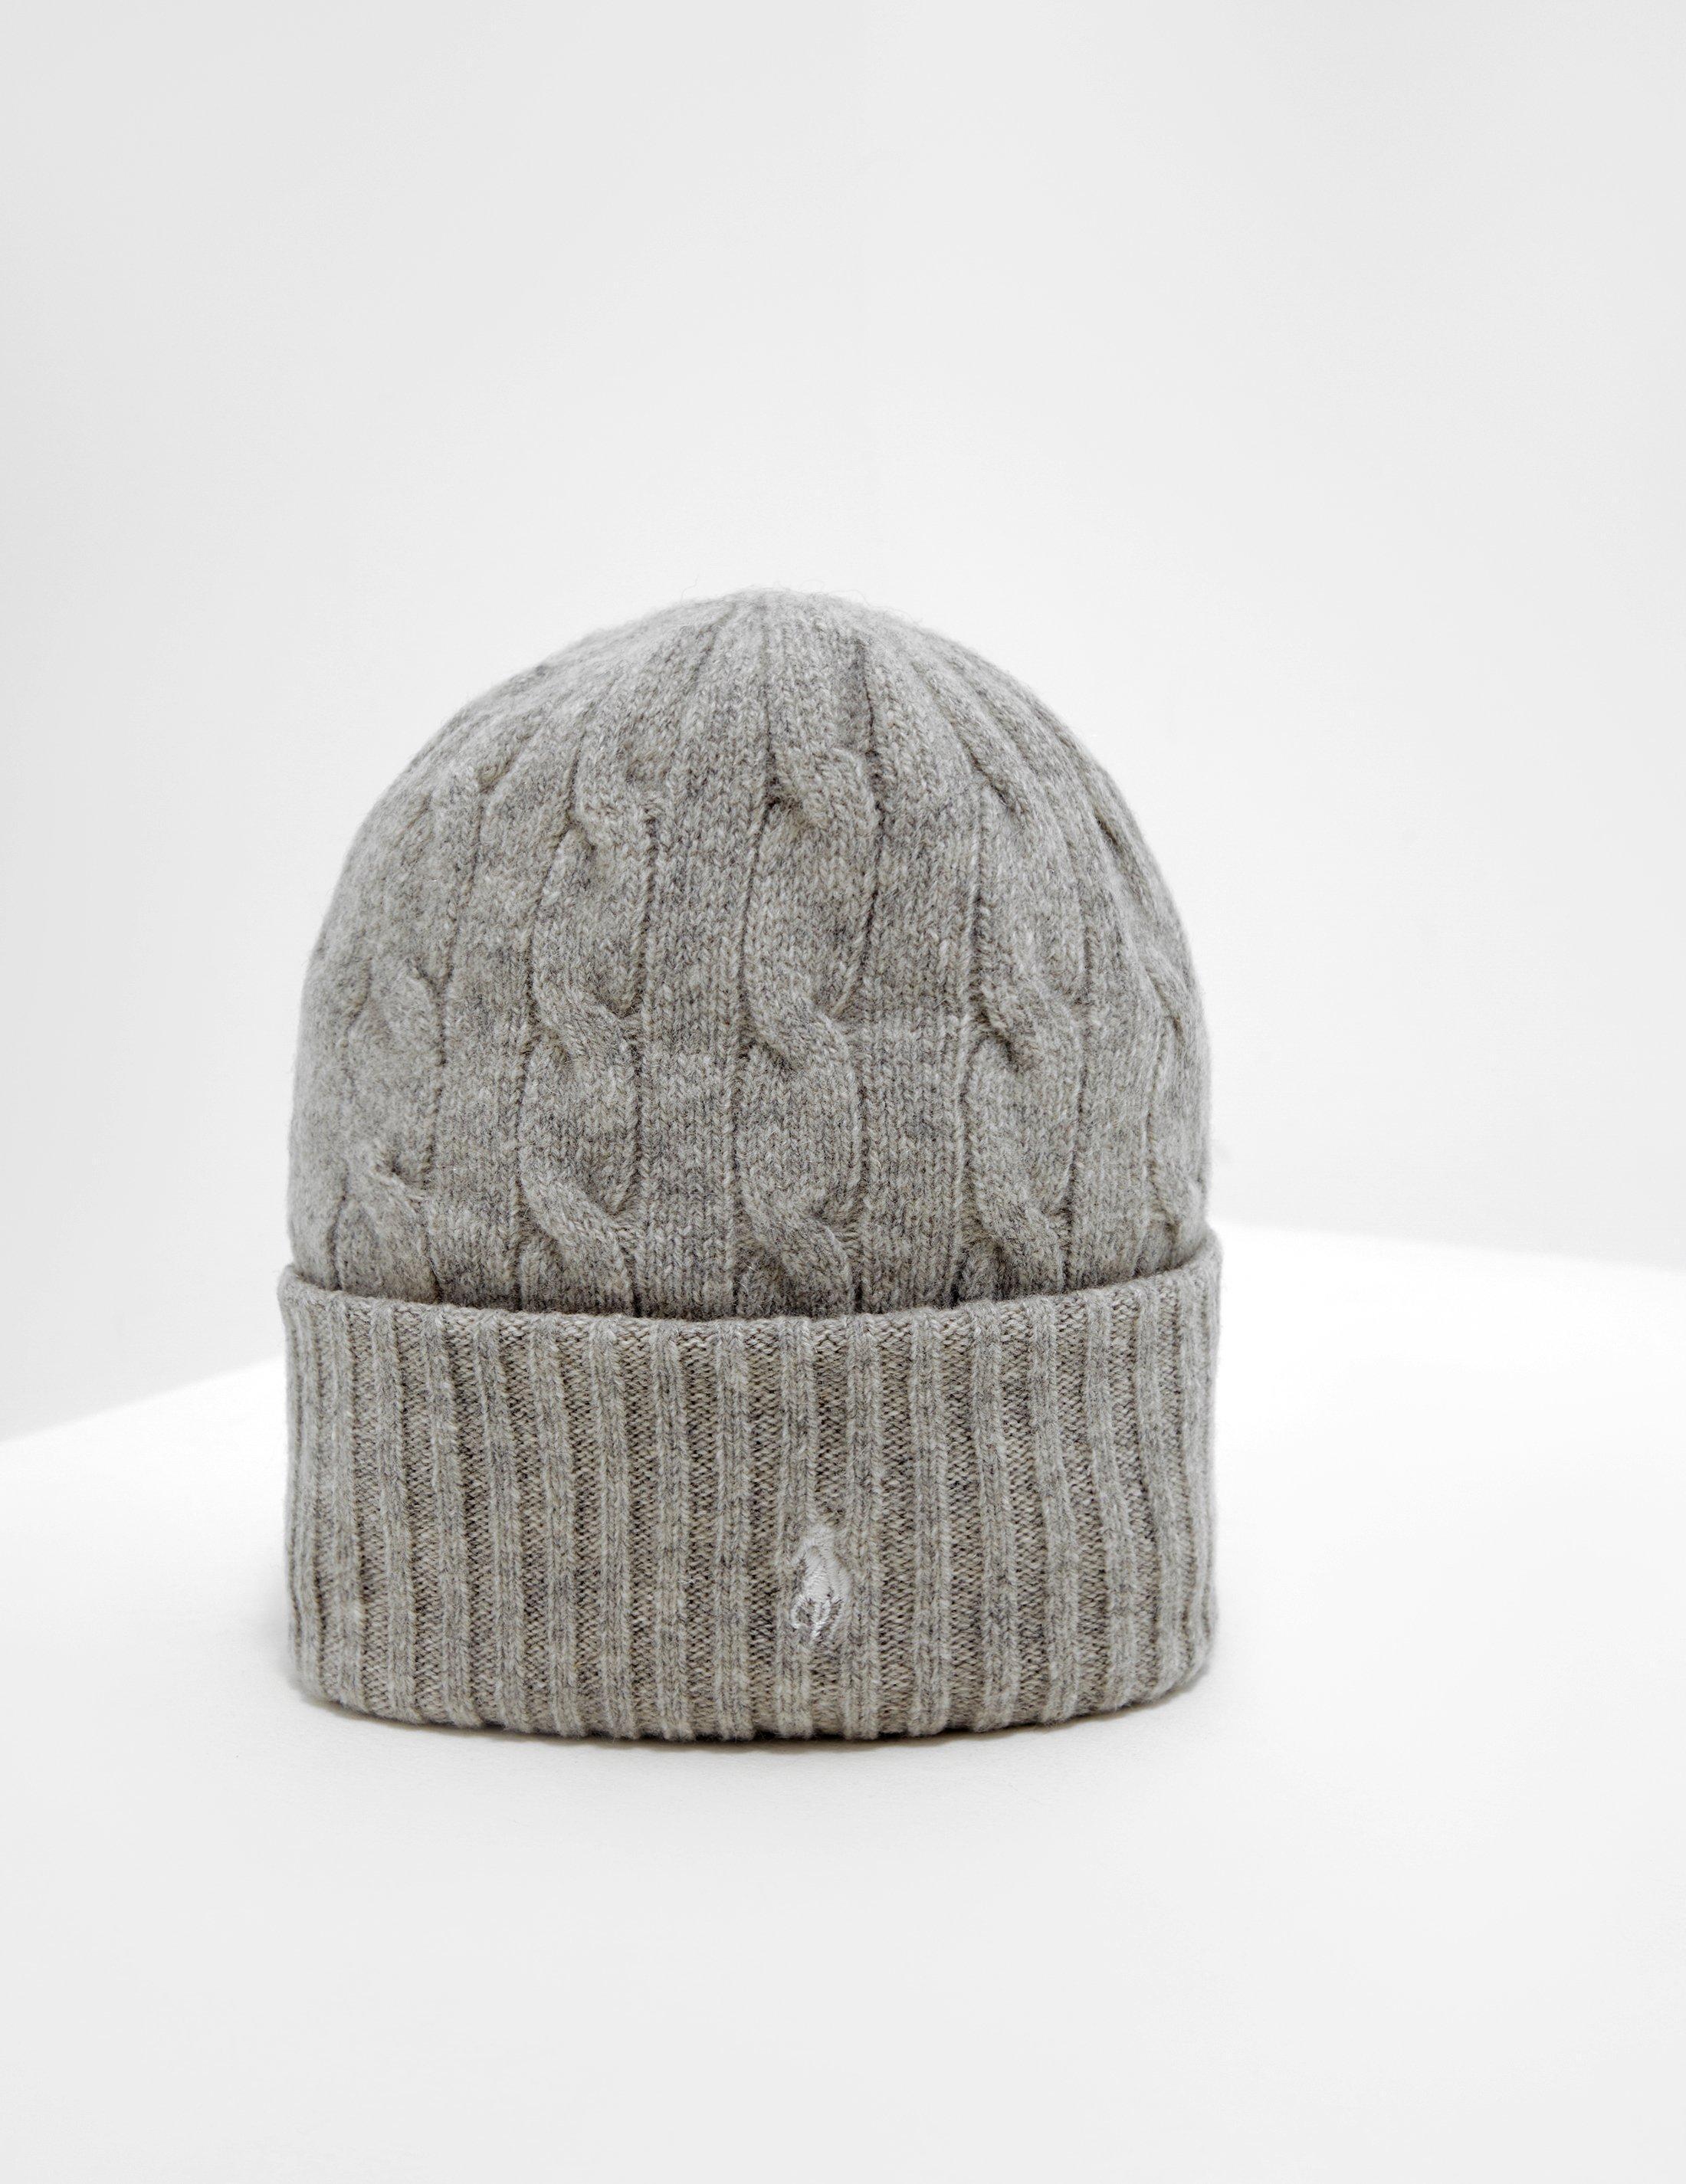 e97678b4053526 Polo Ralph Lauren Wool Beanie Grey in Gray - Lyst